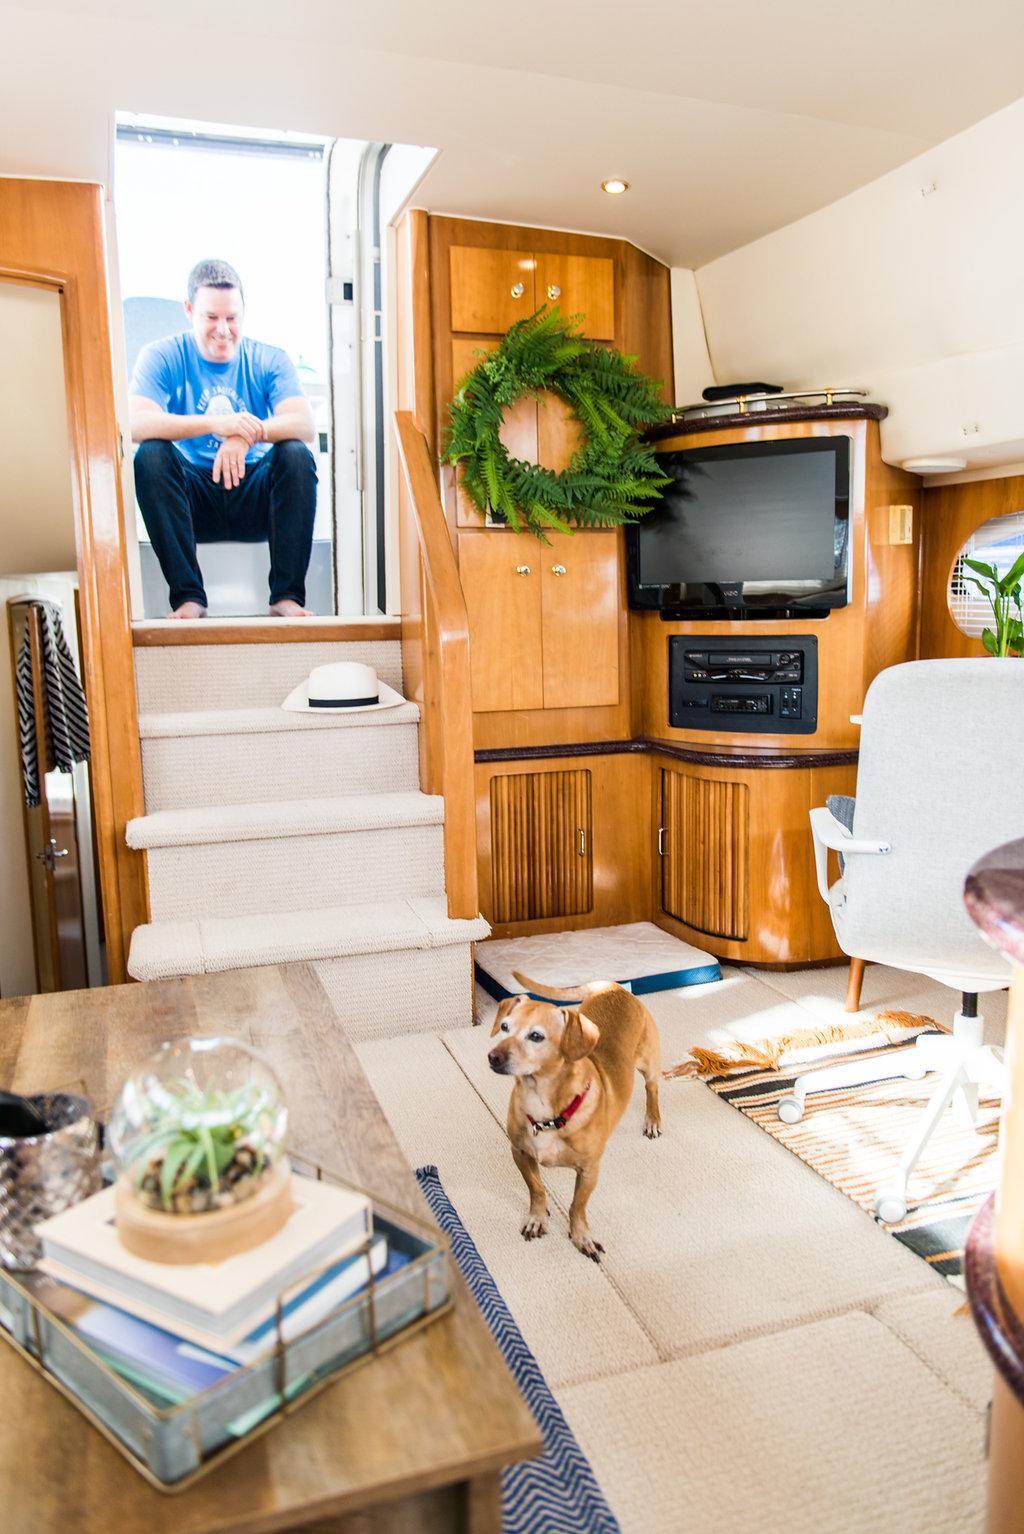 A Peek Inside Our Boat (Turned Tiny Home) -